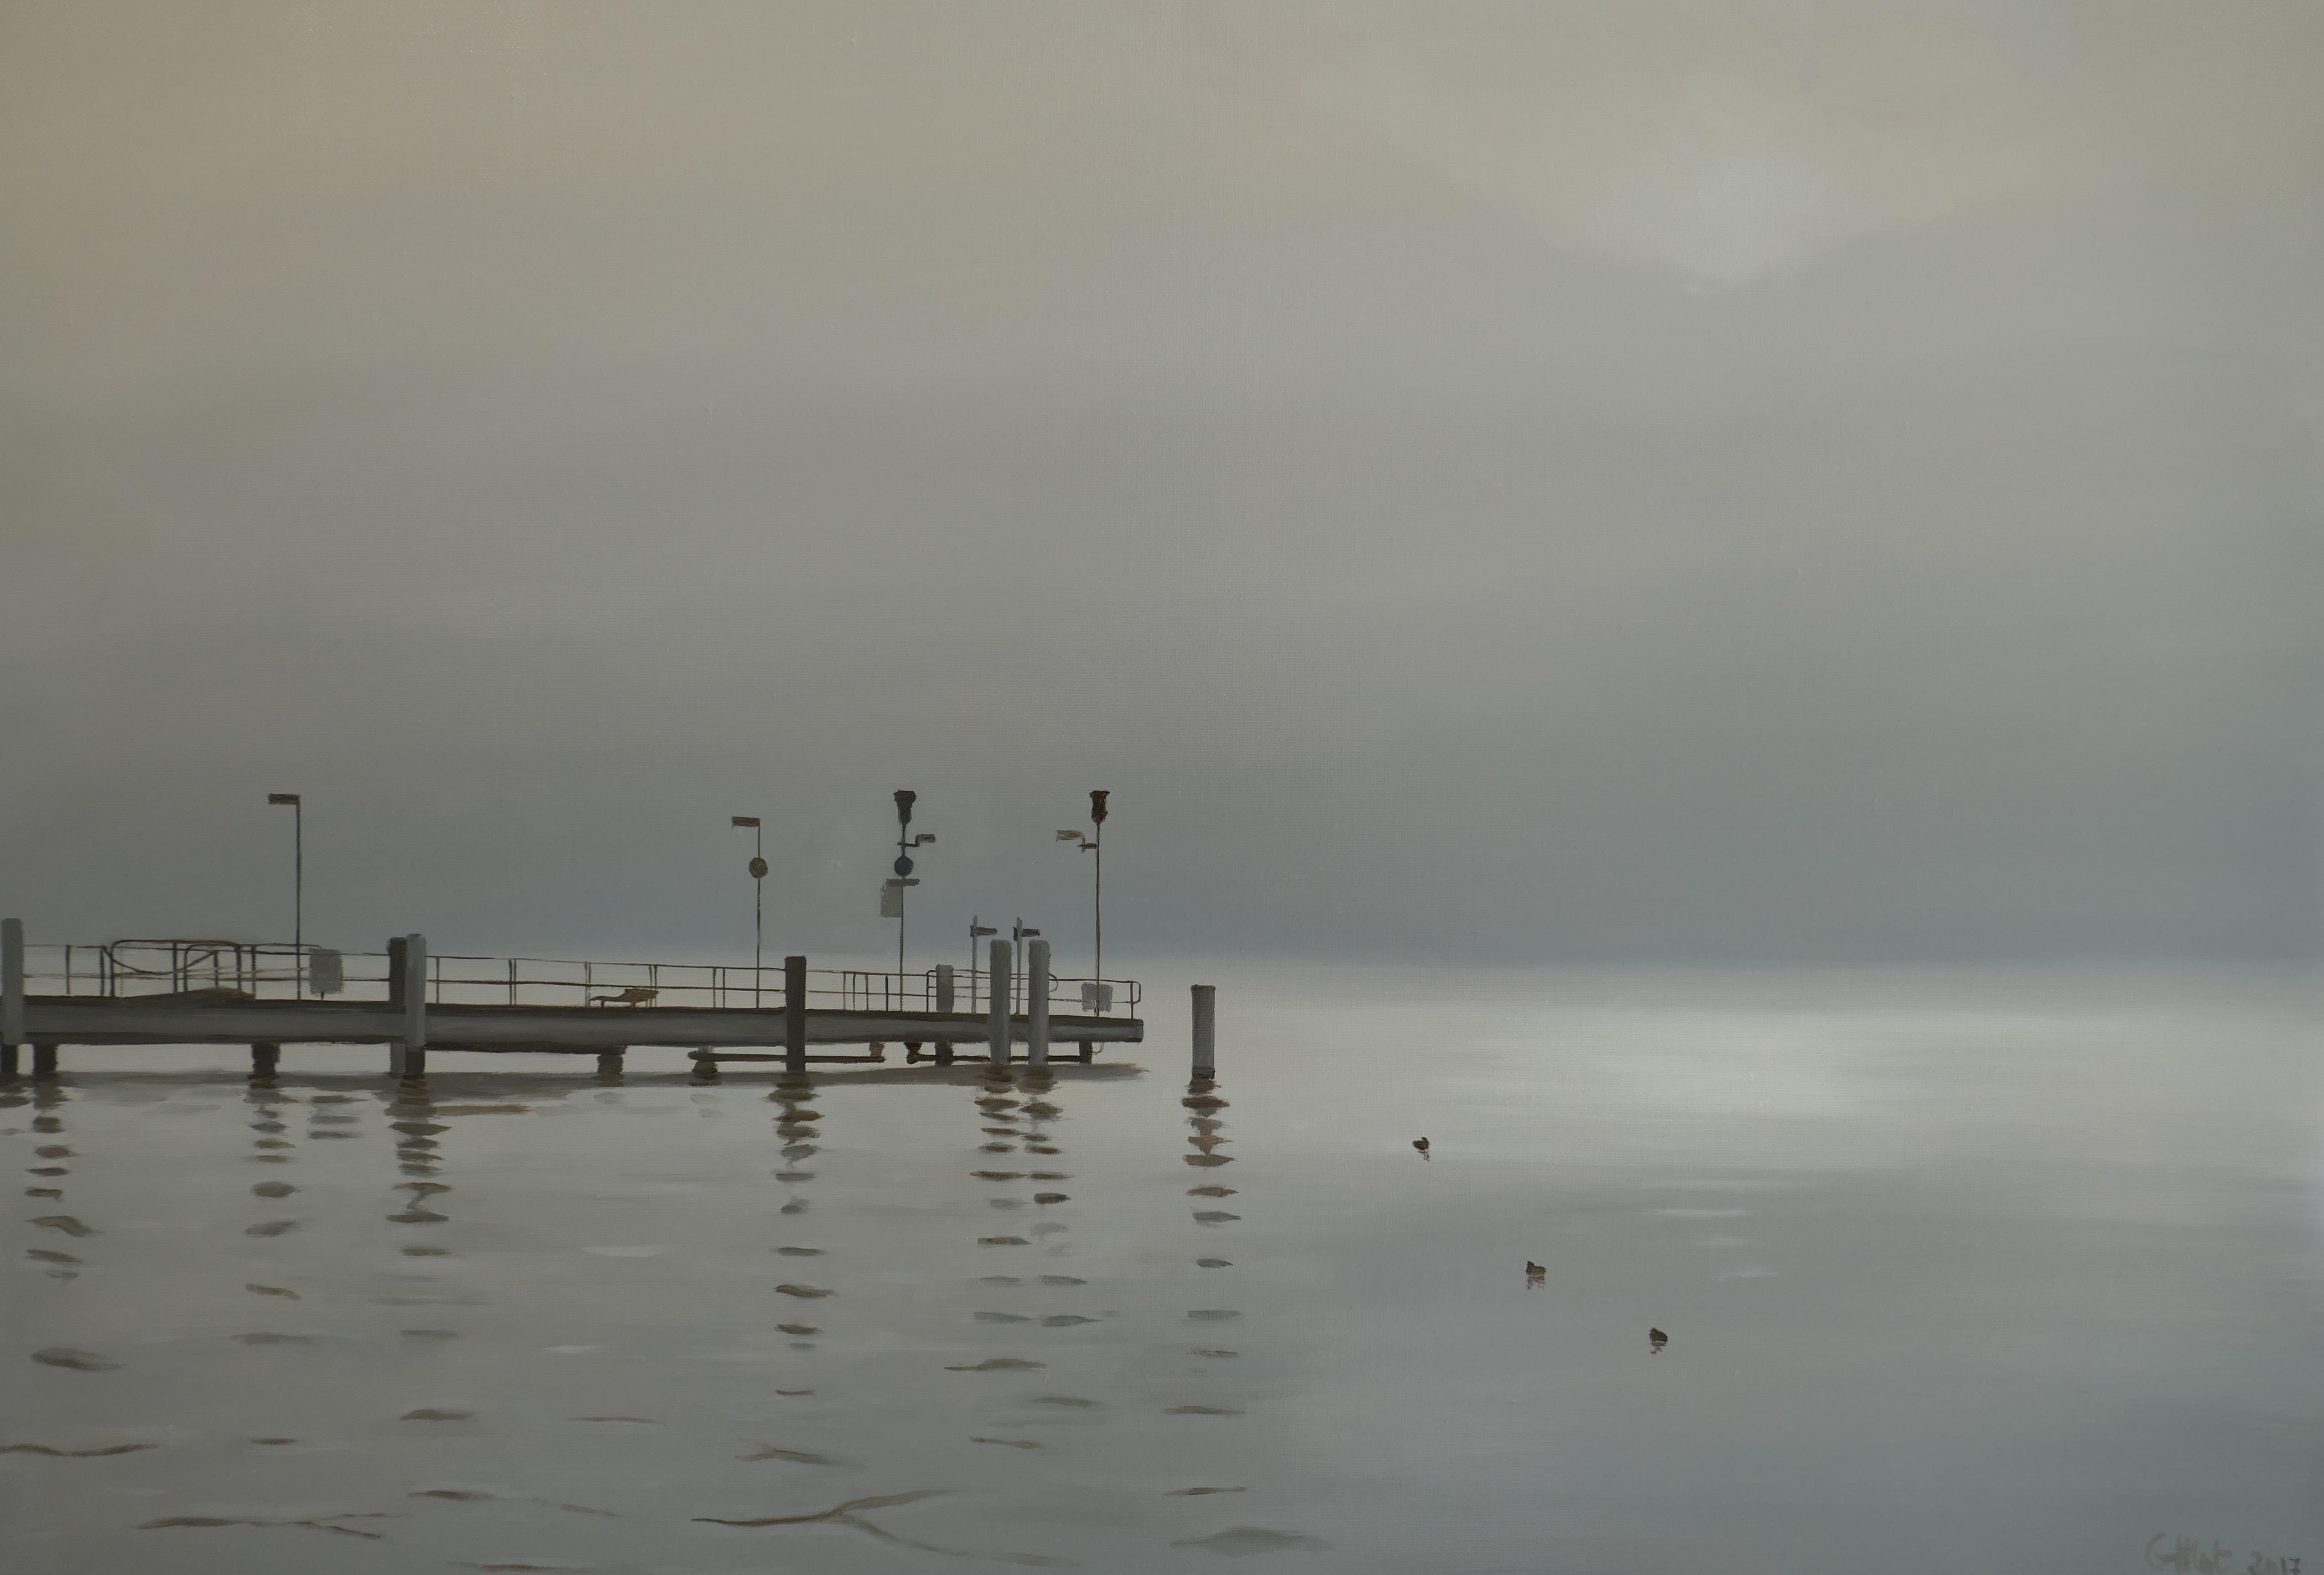 Jetée dans la brume, Zurichsee